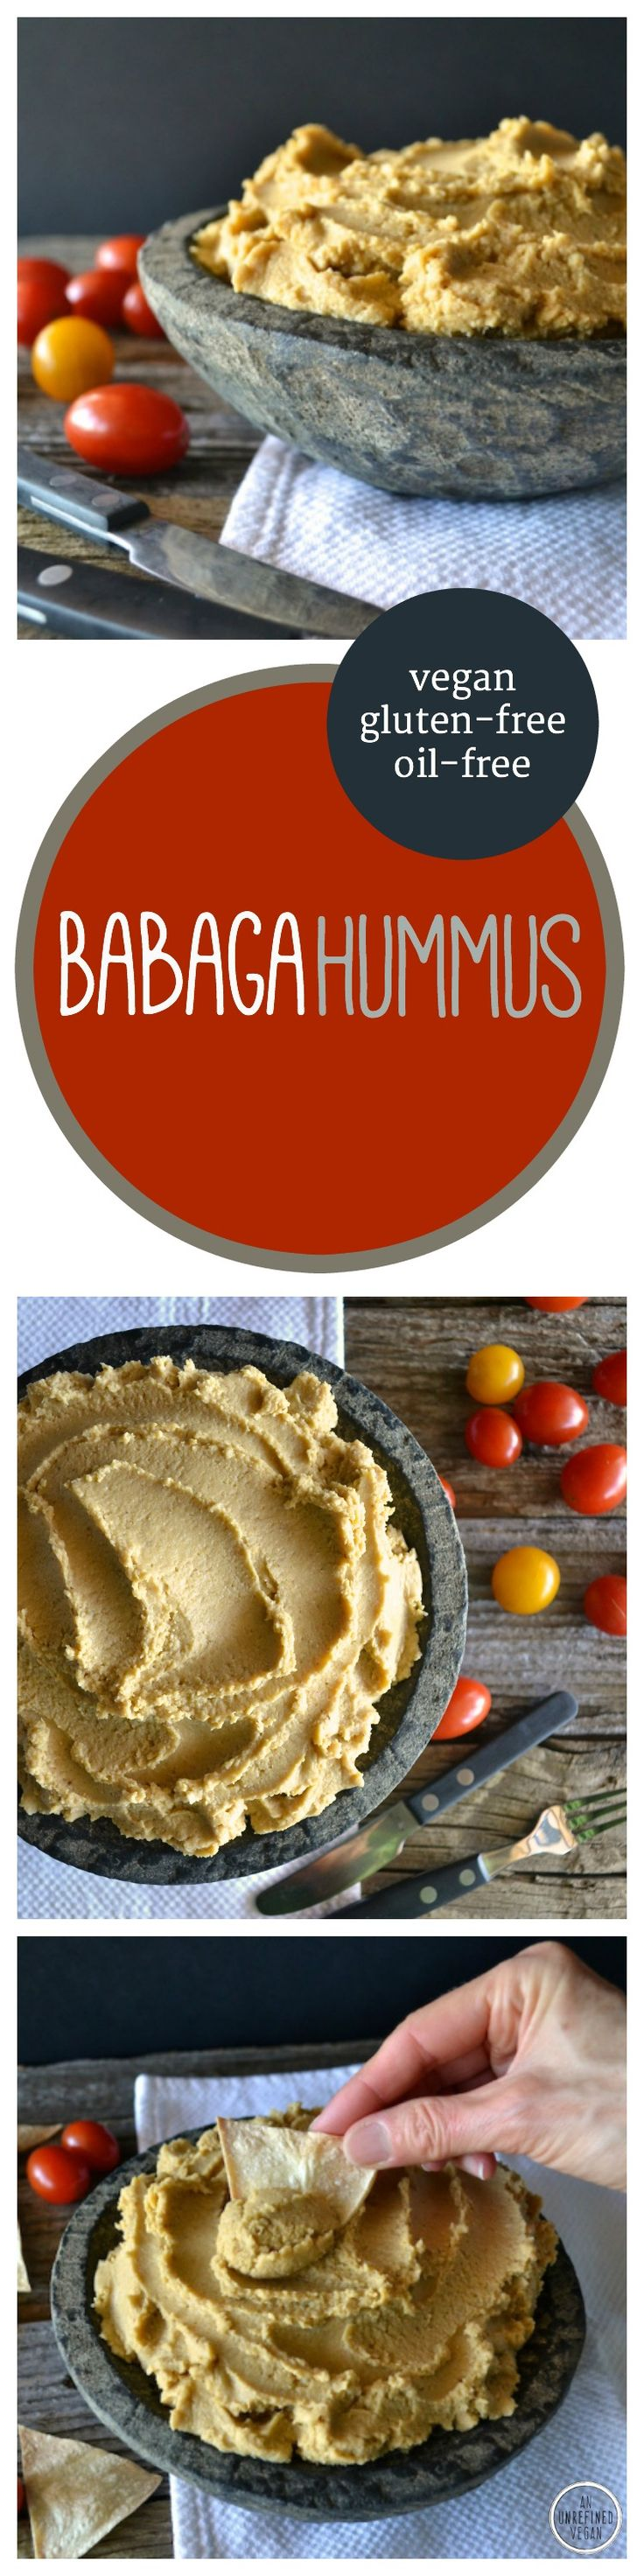 A vegan, gluten-free, oil-free hybrid of hummus and babaganoush. On An Unrefined Vegan.